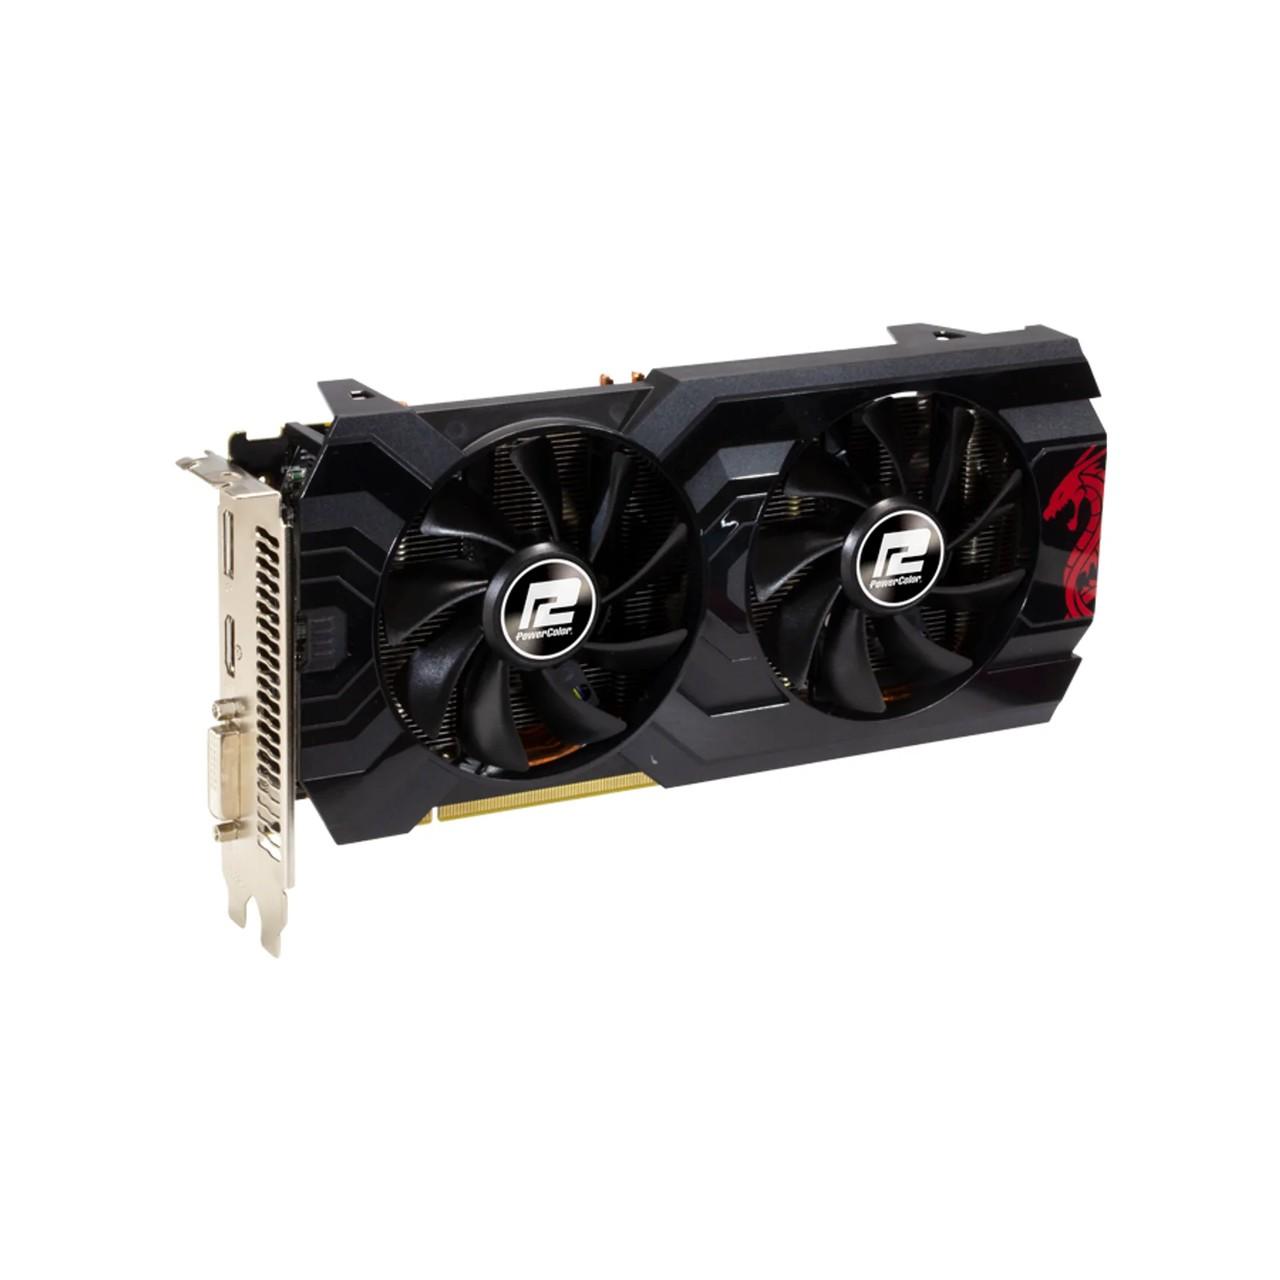 PLACA DE VIDEO POWER COLOR RADEON RX 570 4GB RED DRAGON AXRX 570 4GBD5-DHDV3/OC